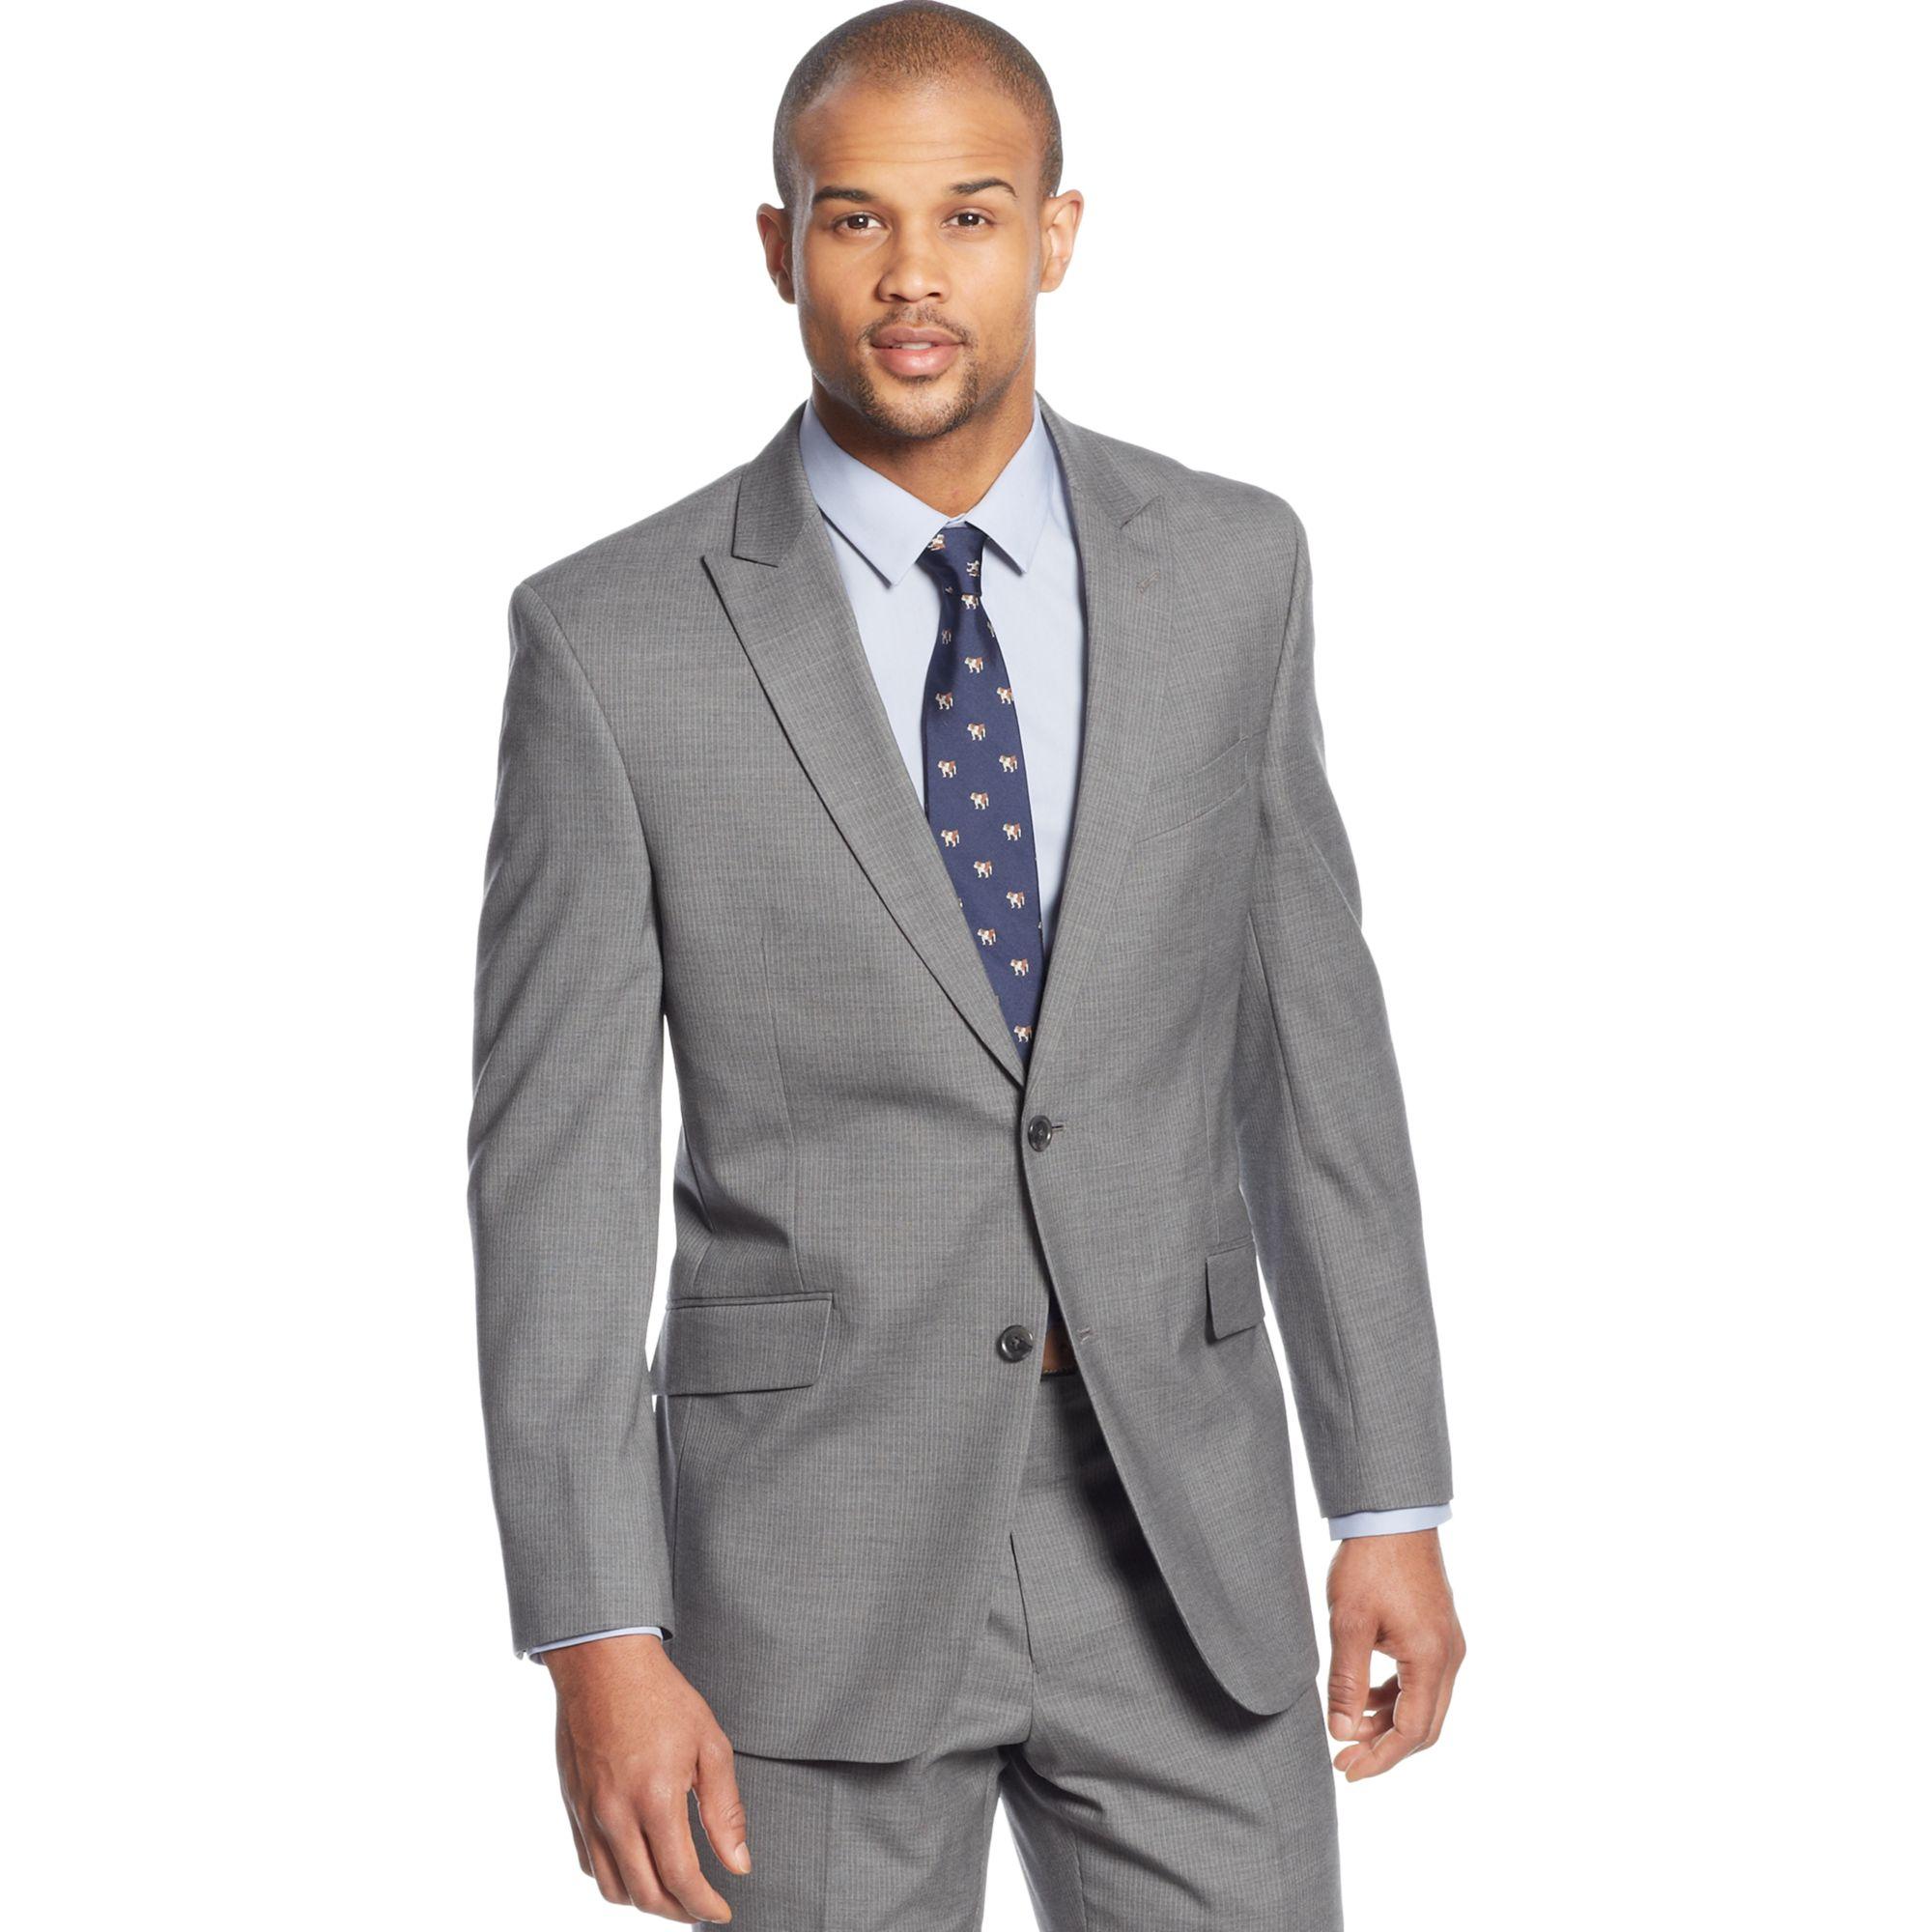 tommy hilfiger grey pinstripe suit – Maskbook